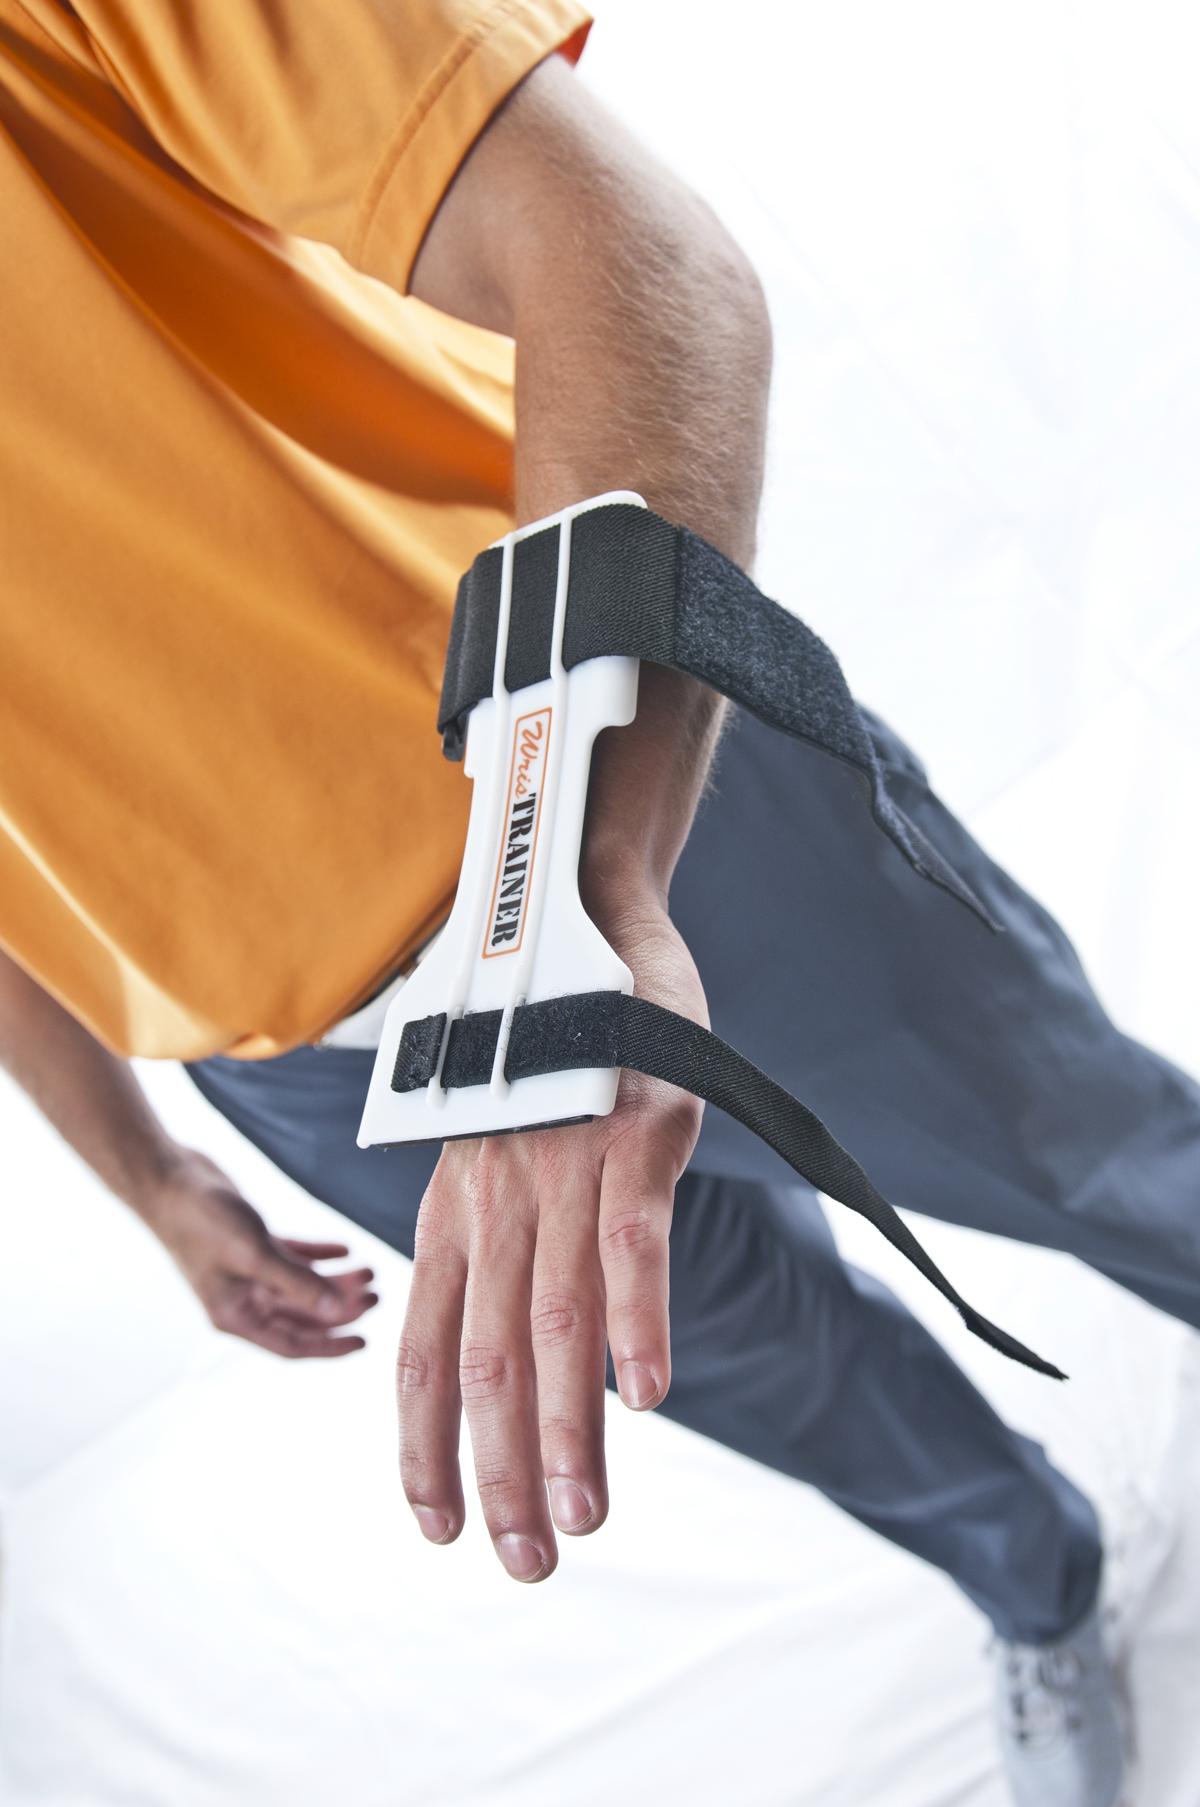 WrisTRAINER Lead Wrist Installation Shot 2